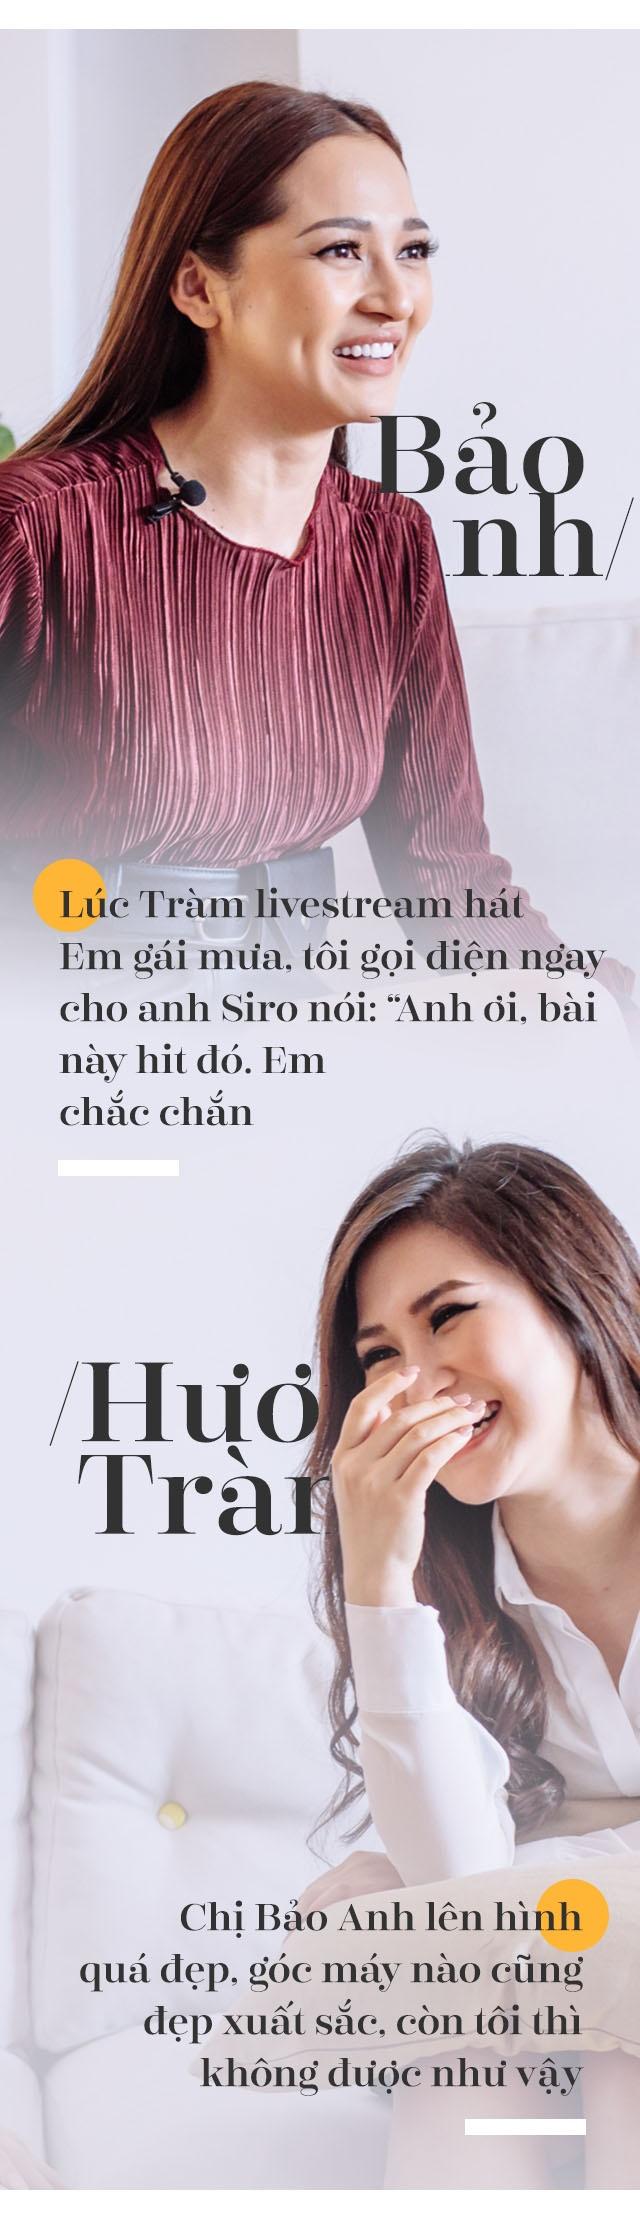 Bao Anh - Huong Tram: 'Nhieu nguoi thich sexy nhung khong dam' hinh anh 4